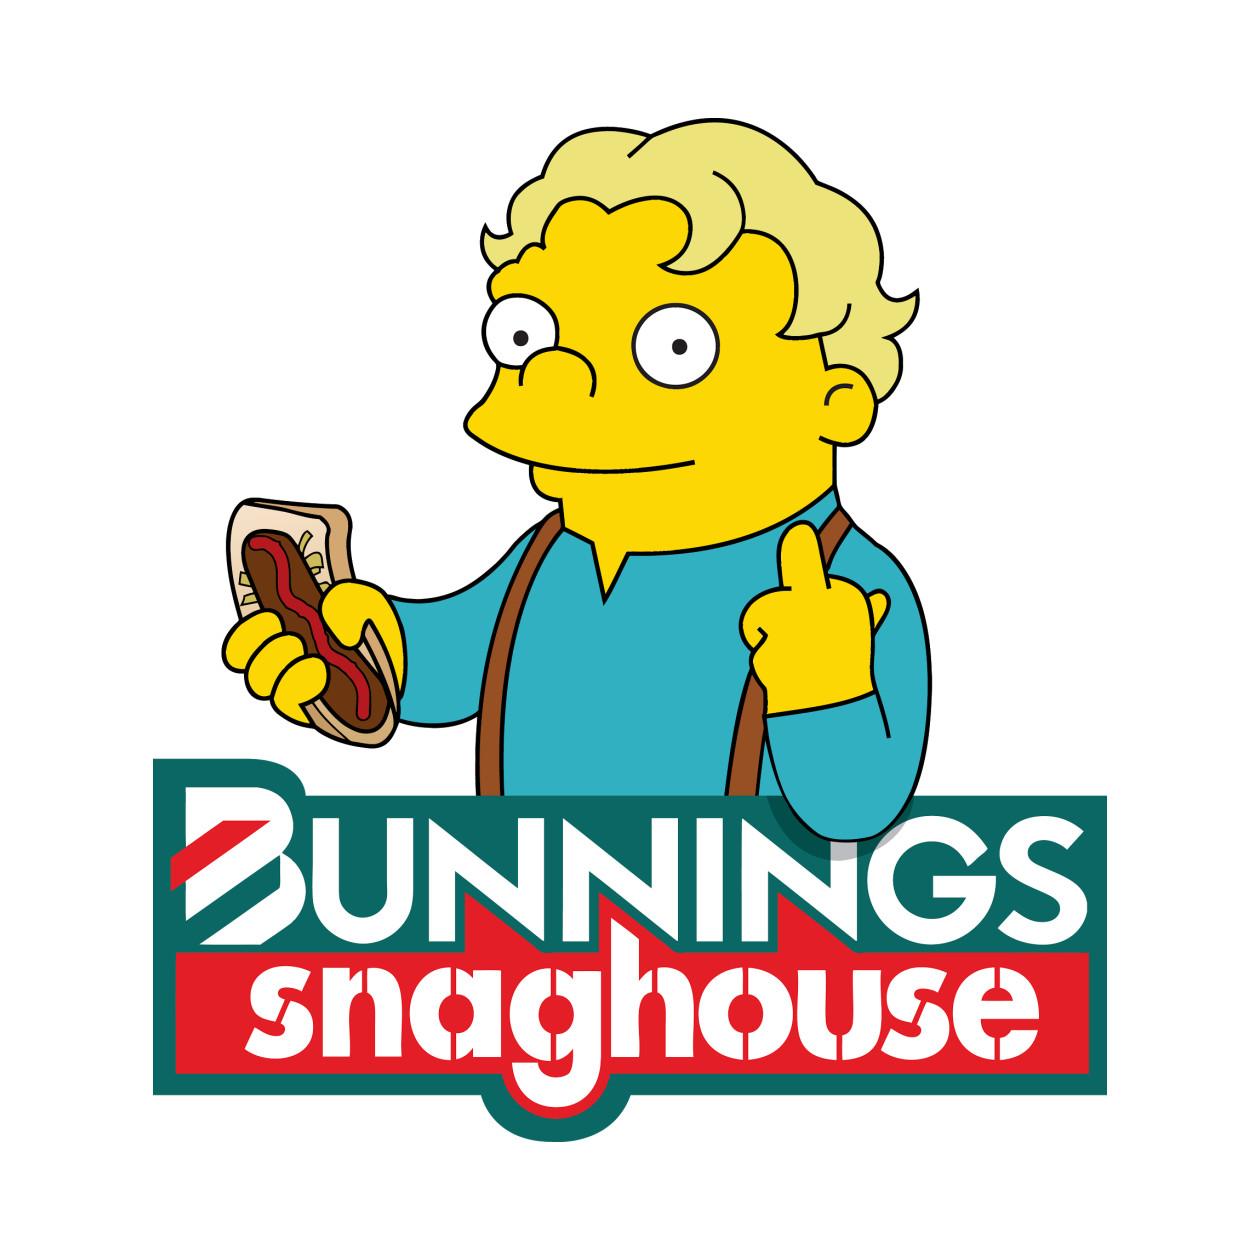 Tobias Bunnings Snaghouse